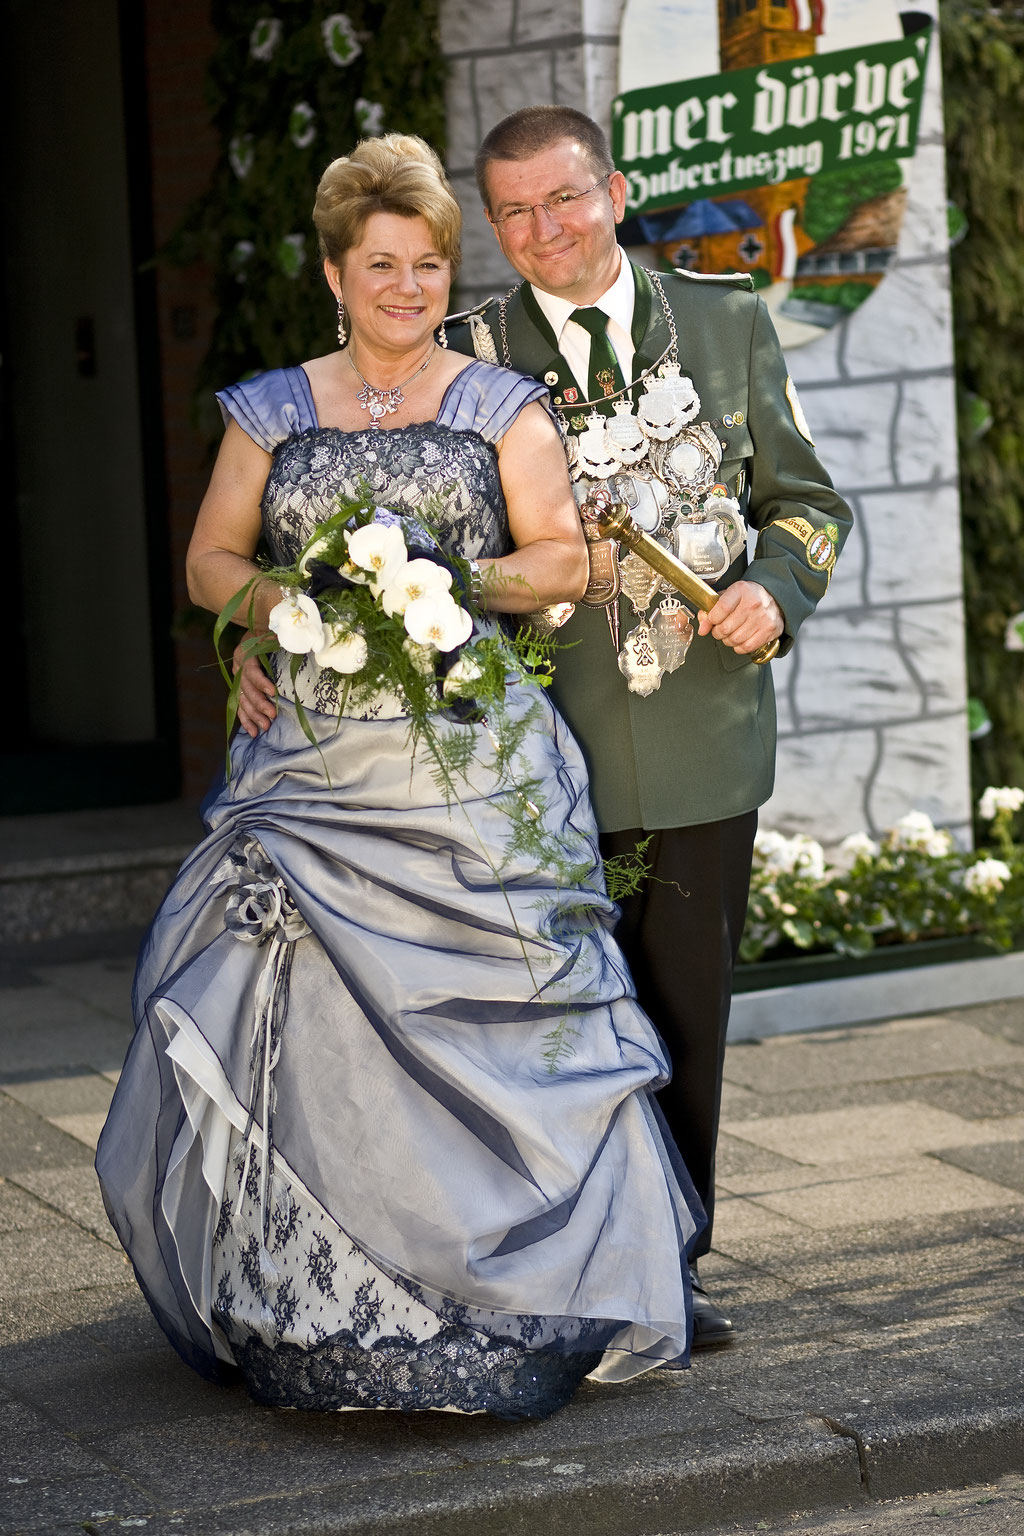 S.M. Klaus Reichl & Königin Regina 2008/2009